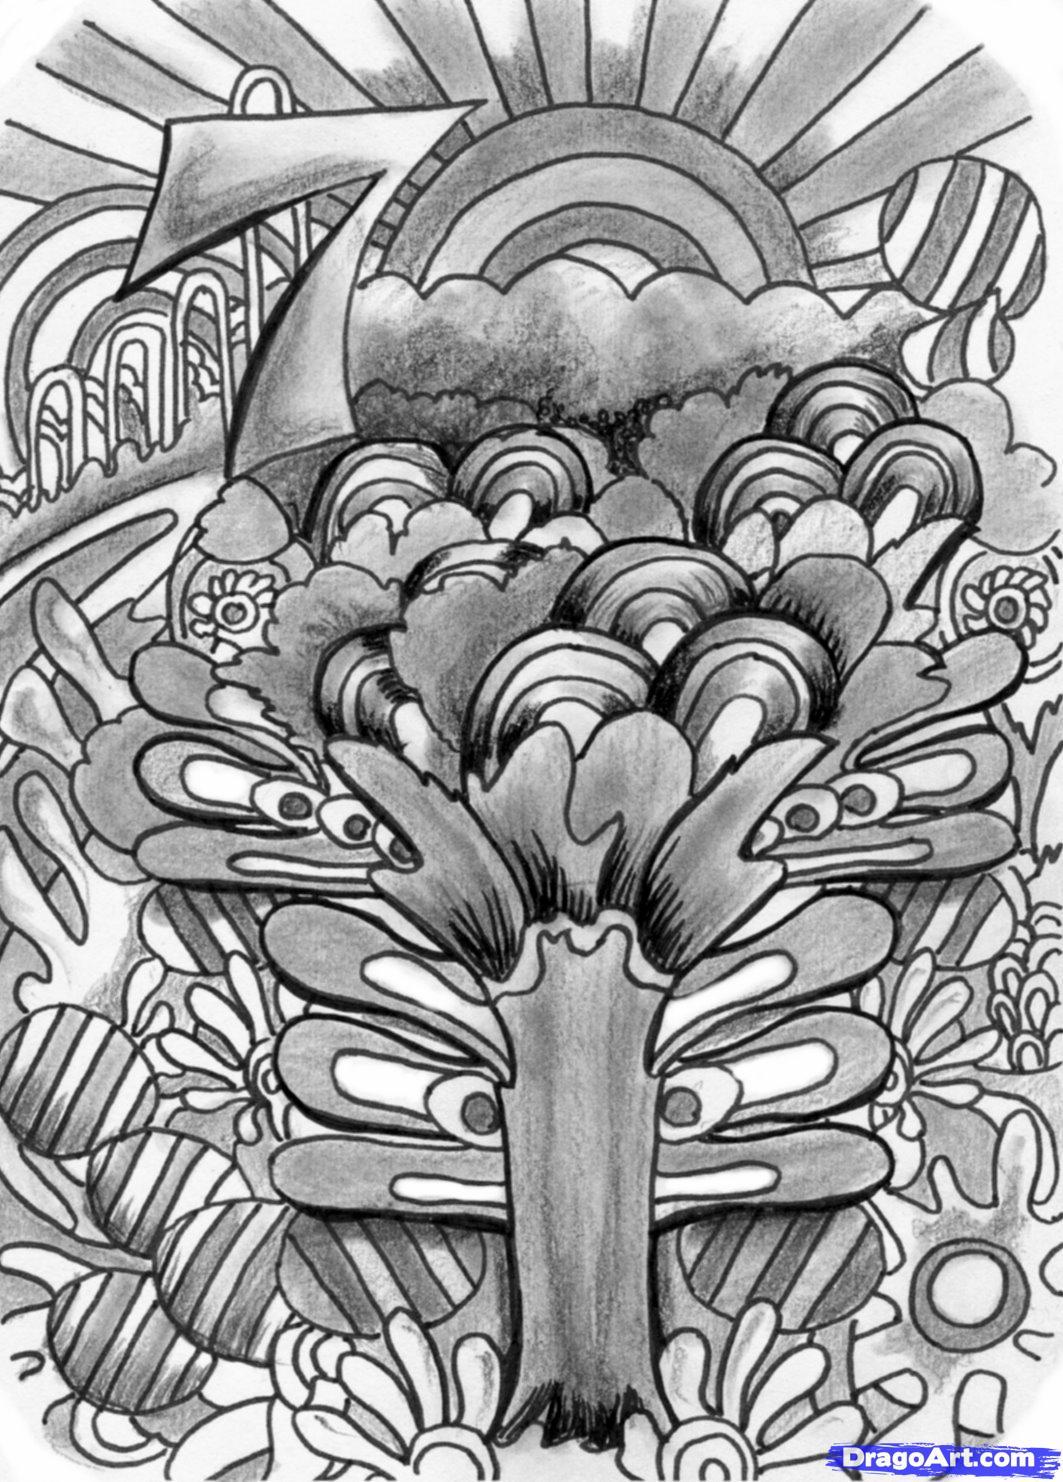 Drawn triipy Trippy  Art by art